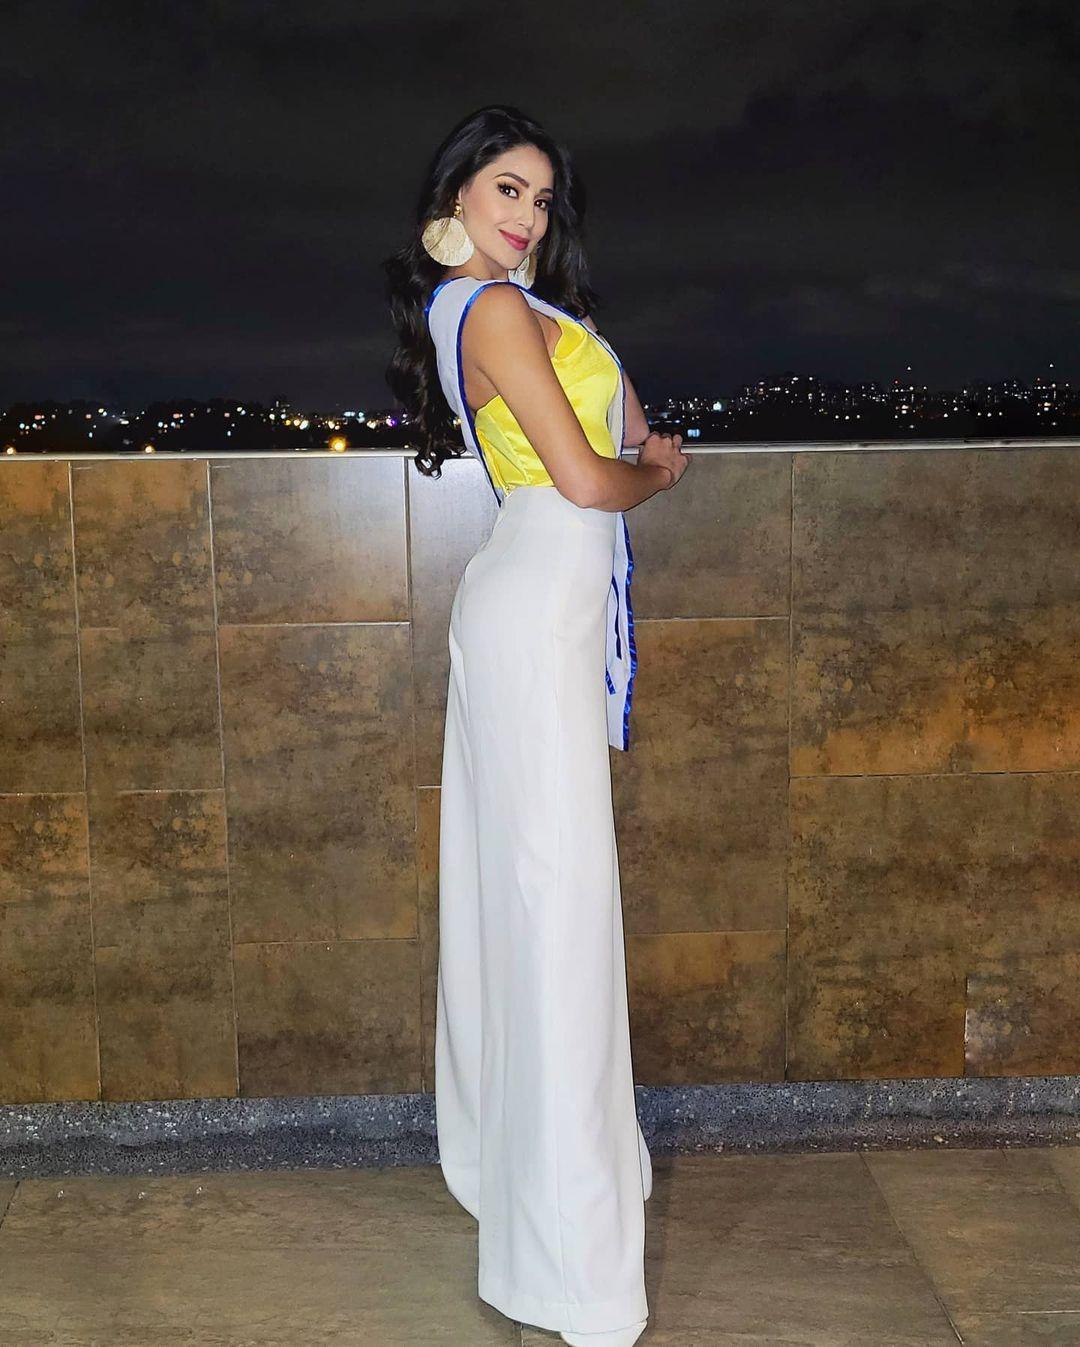 andrea aguilera, miss world colombia 2021. - Página 4 22907812